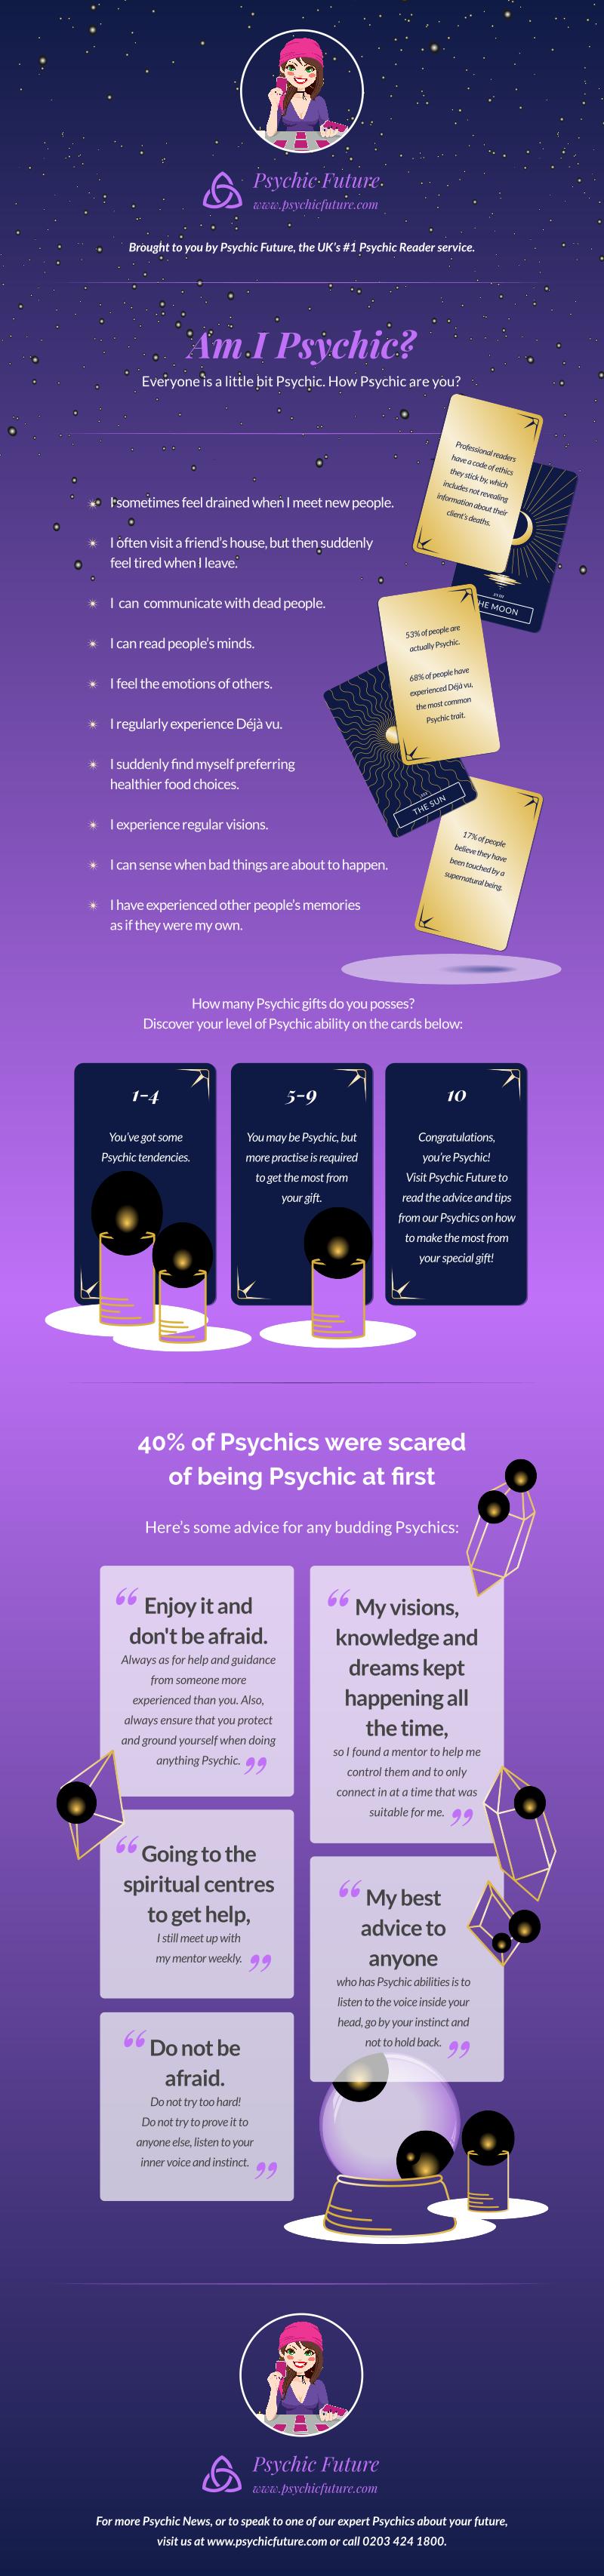 psychic abilities: Pinterest graphic